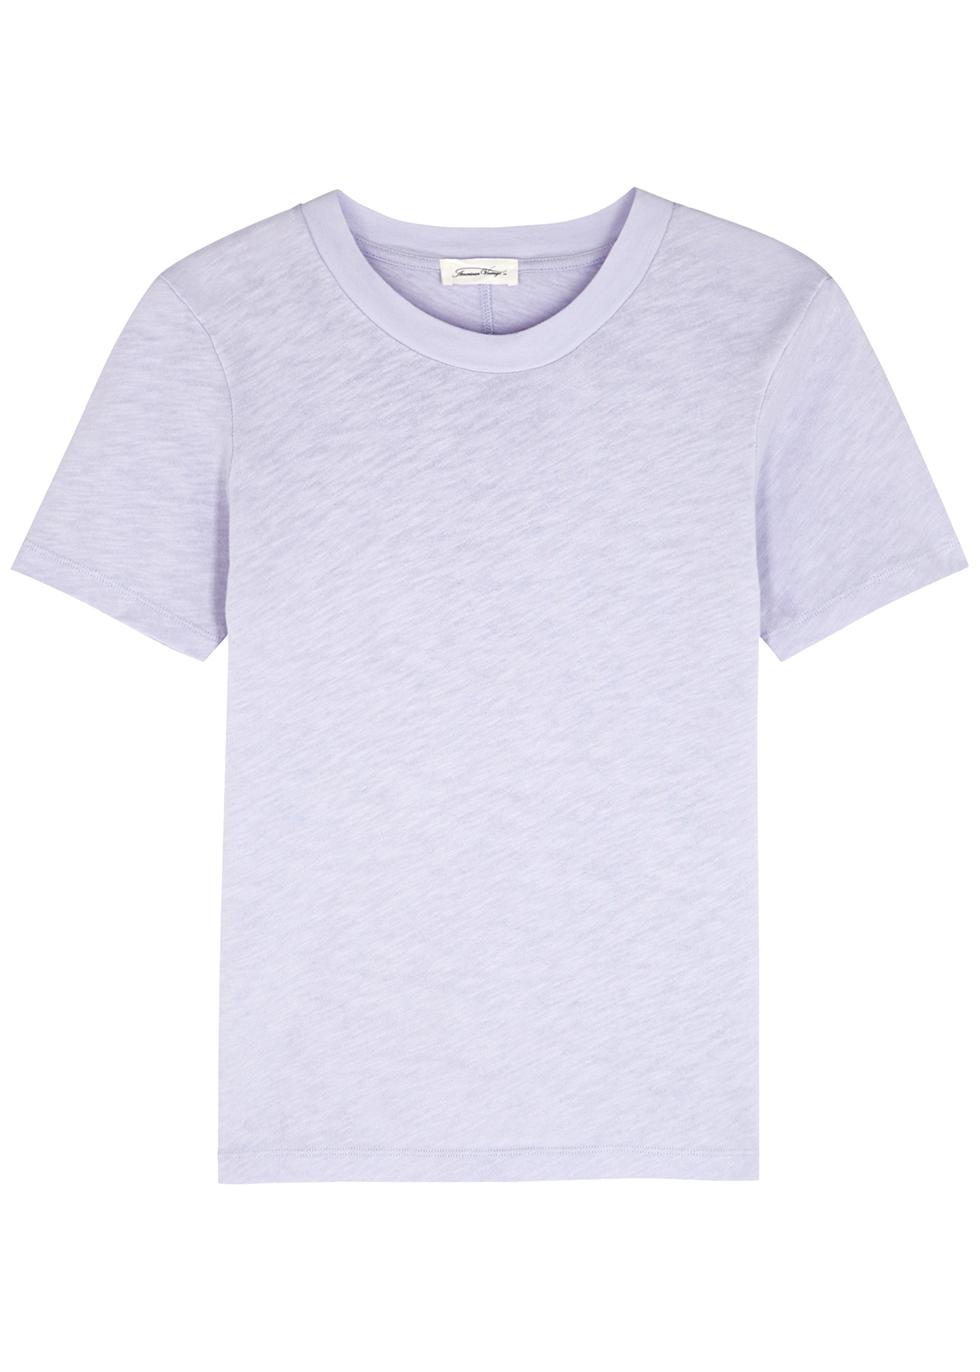 Sonoma lilac slubbed cotton T-shirt